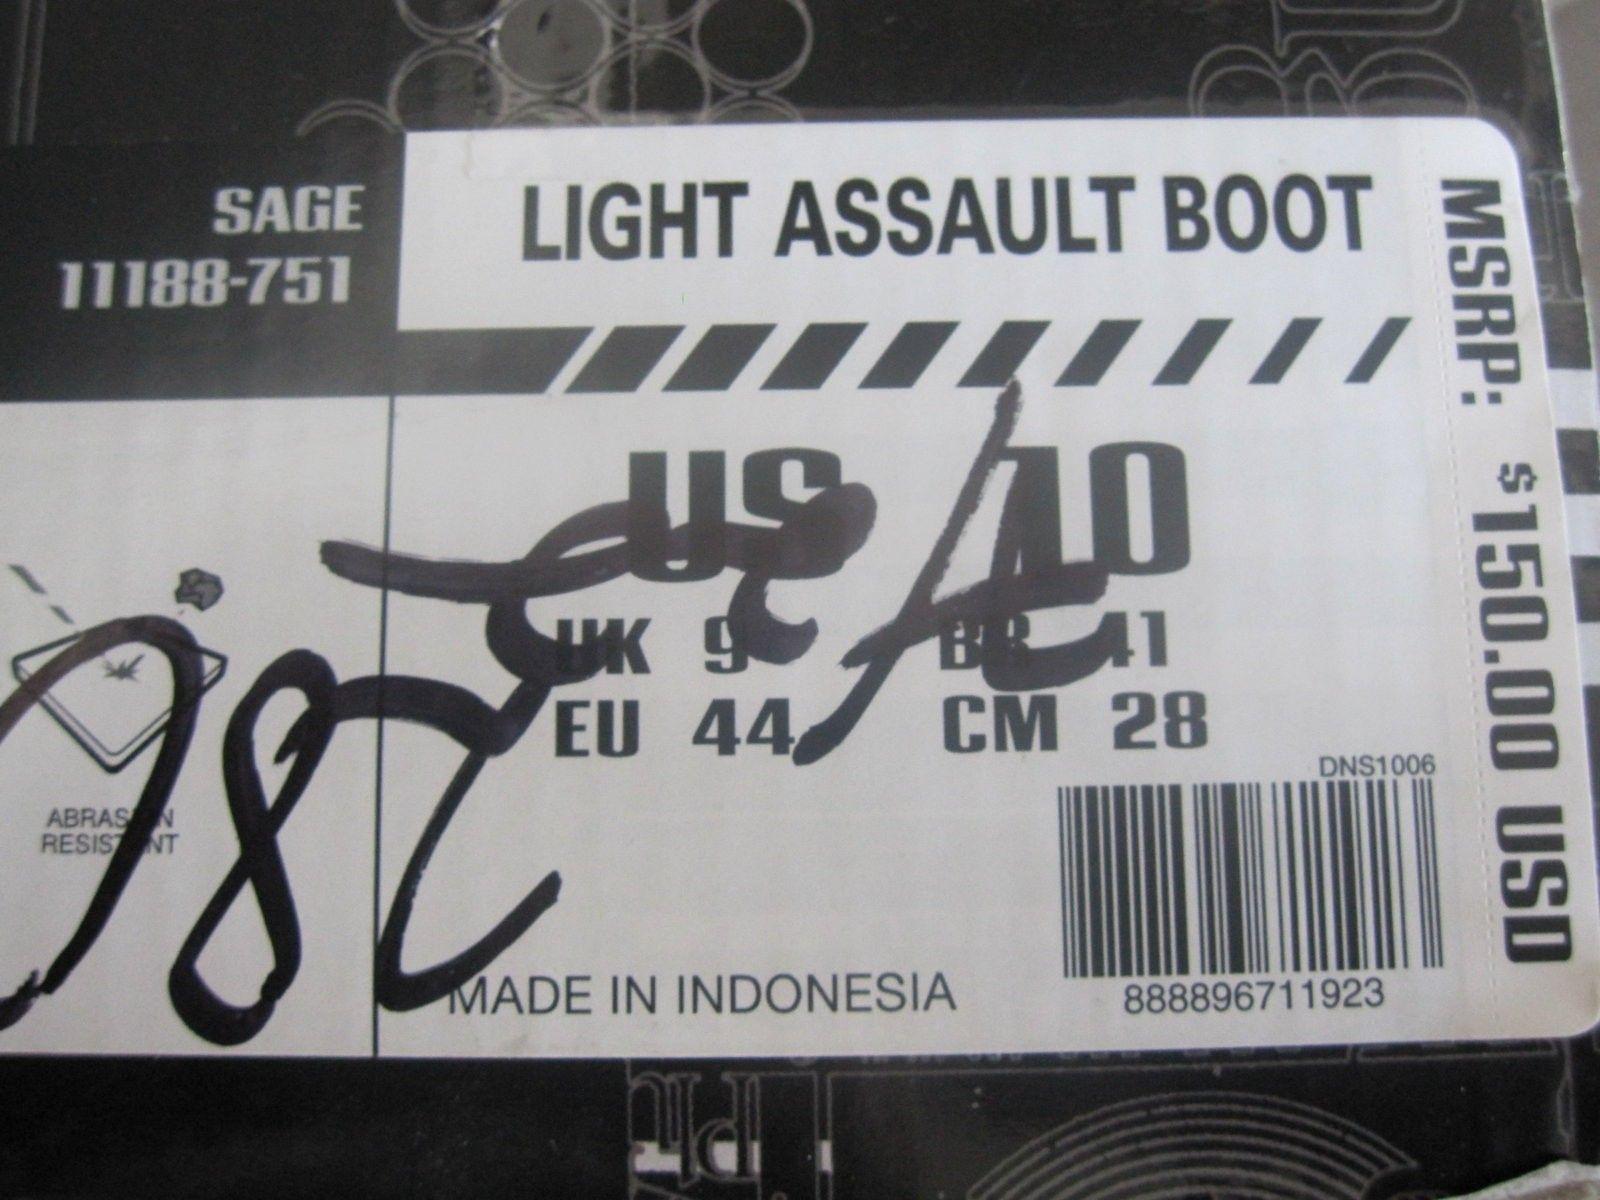 BNIB Light Assault Boots II - Size 10, color Sage Green Air Force - IMG_5036.JPG